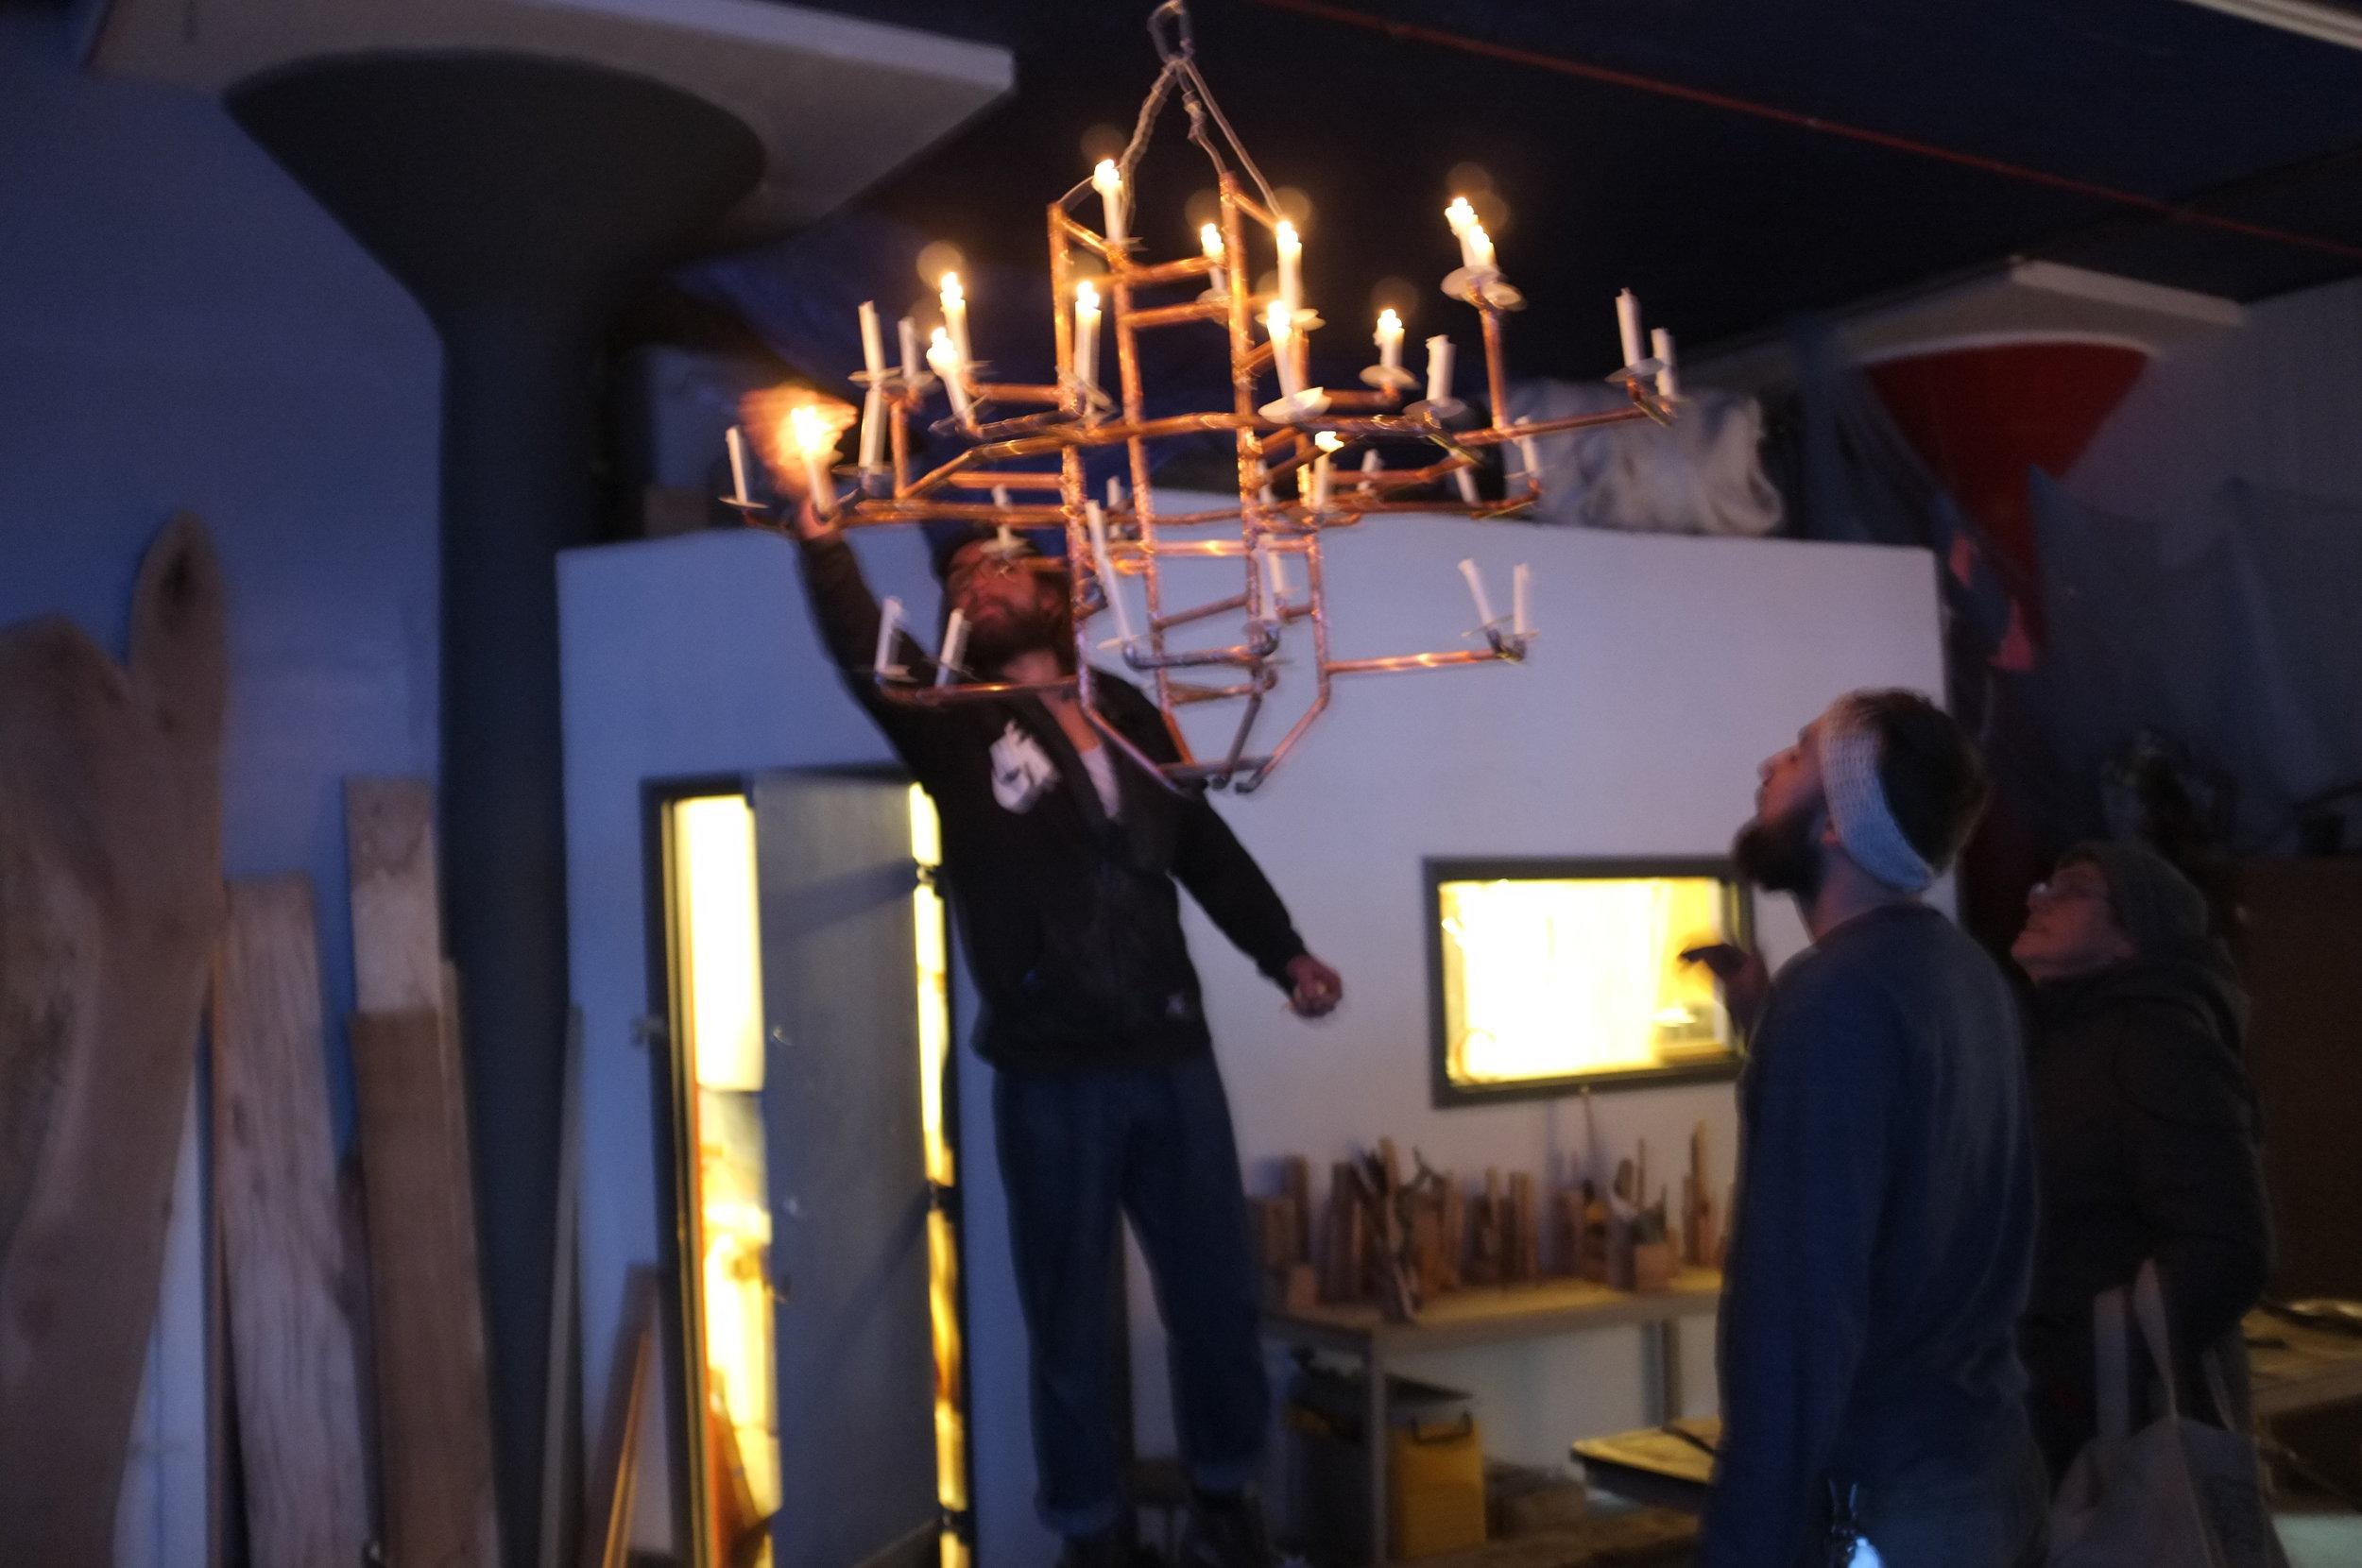 Greg lighting the chandelier